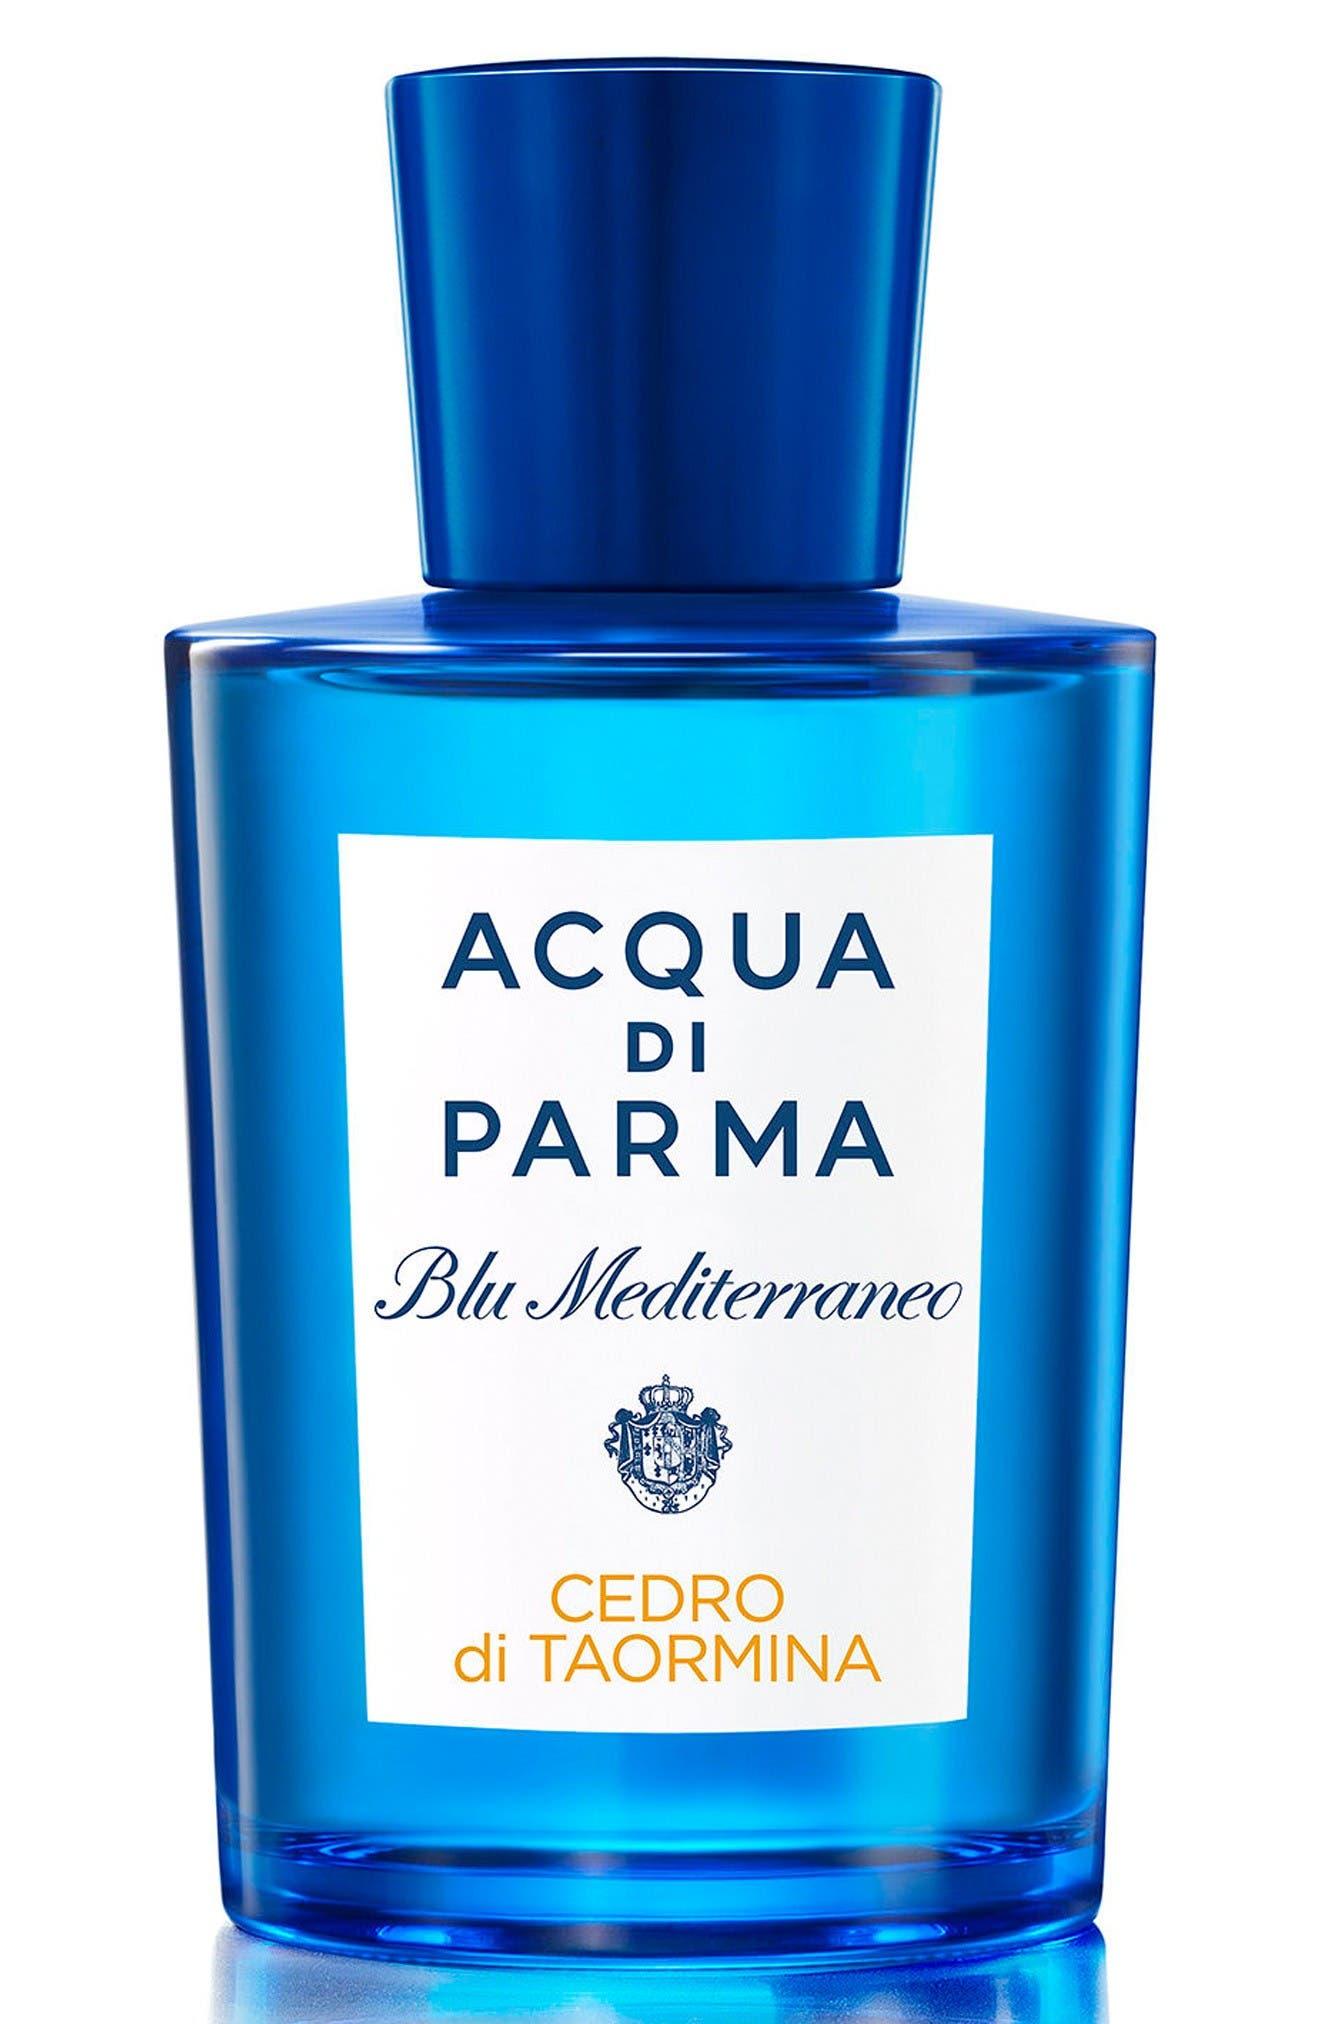 Main Image - Acqua di Parma 'Blu Mediterraneo Cedro di Taormina' Eau de Toilette